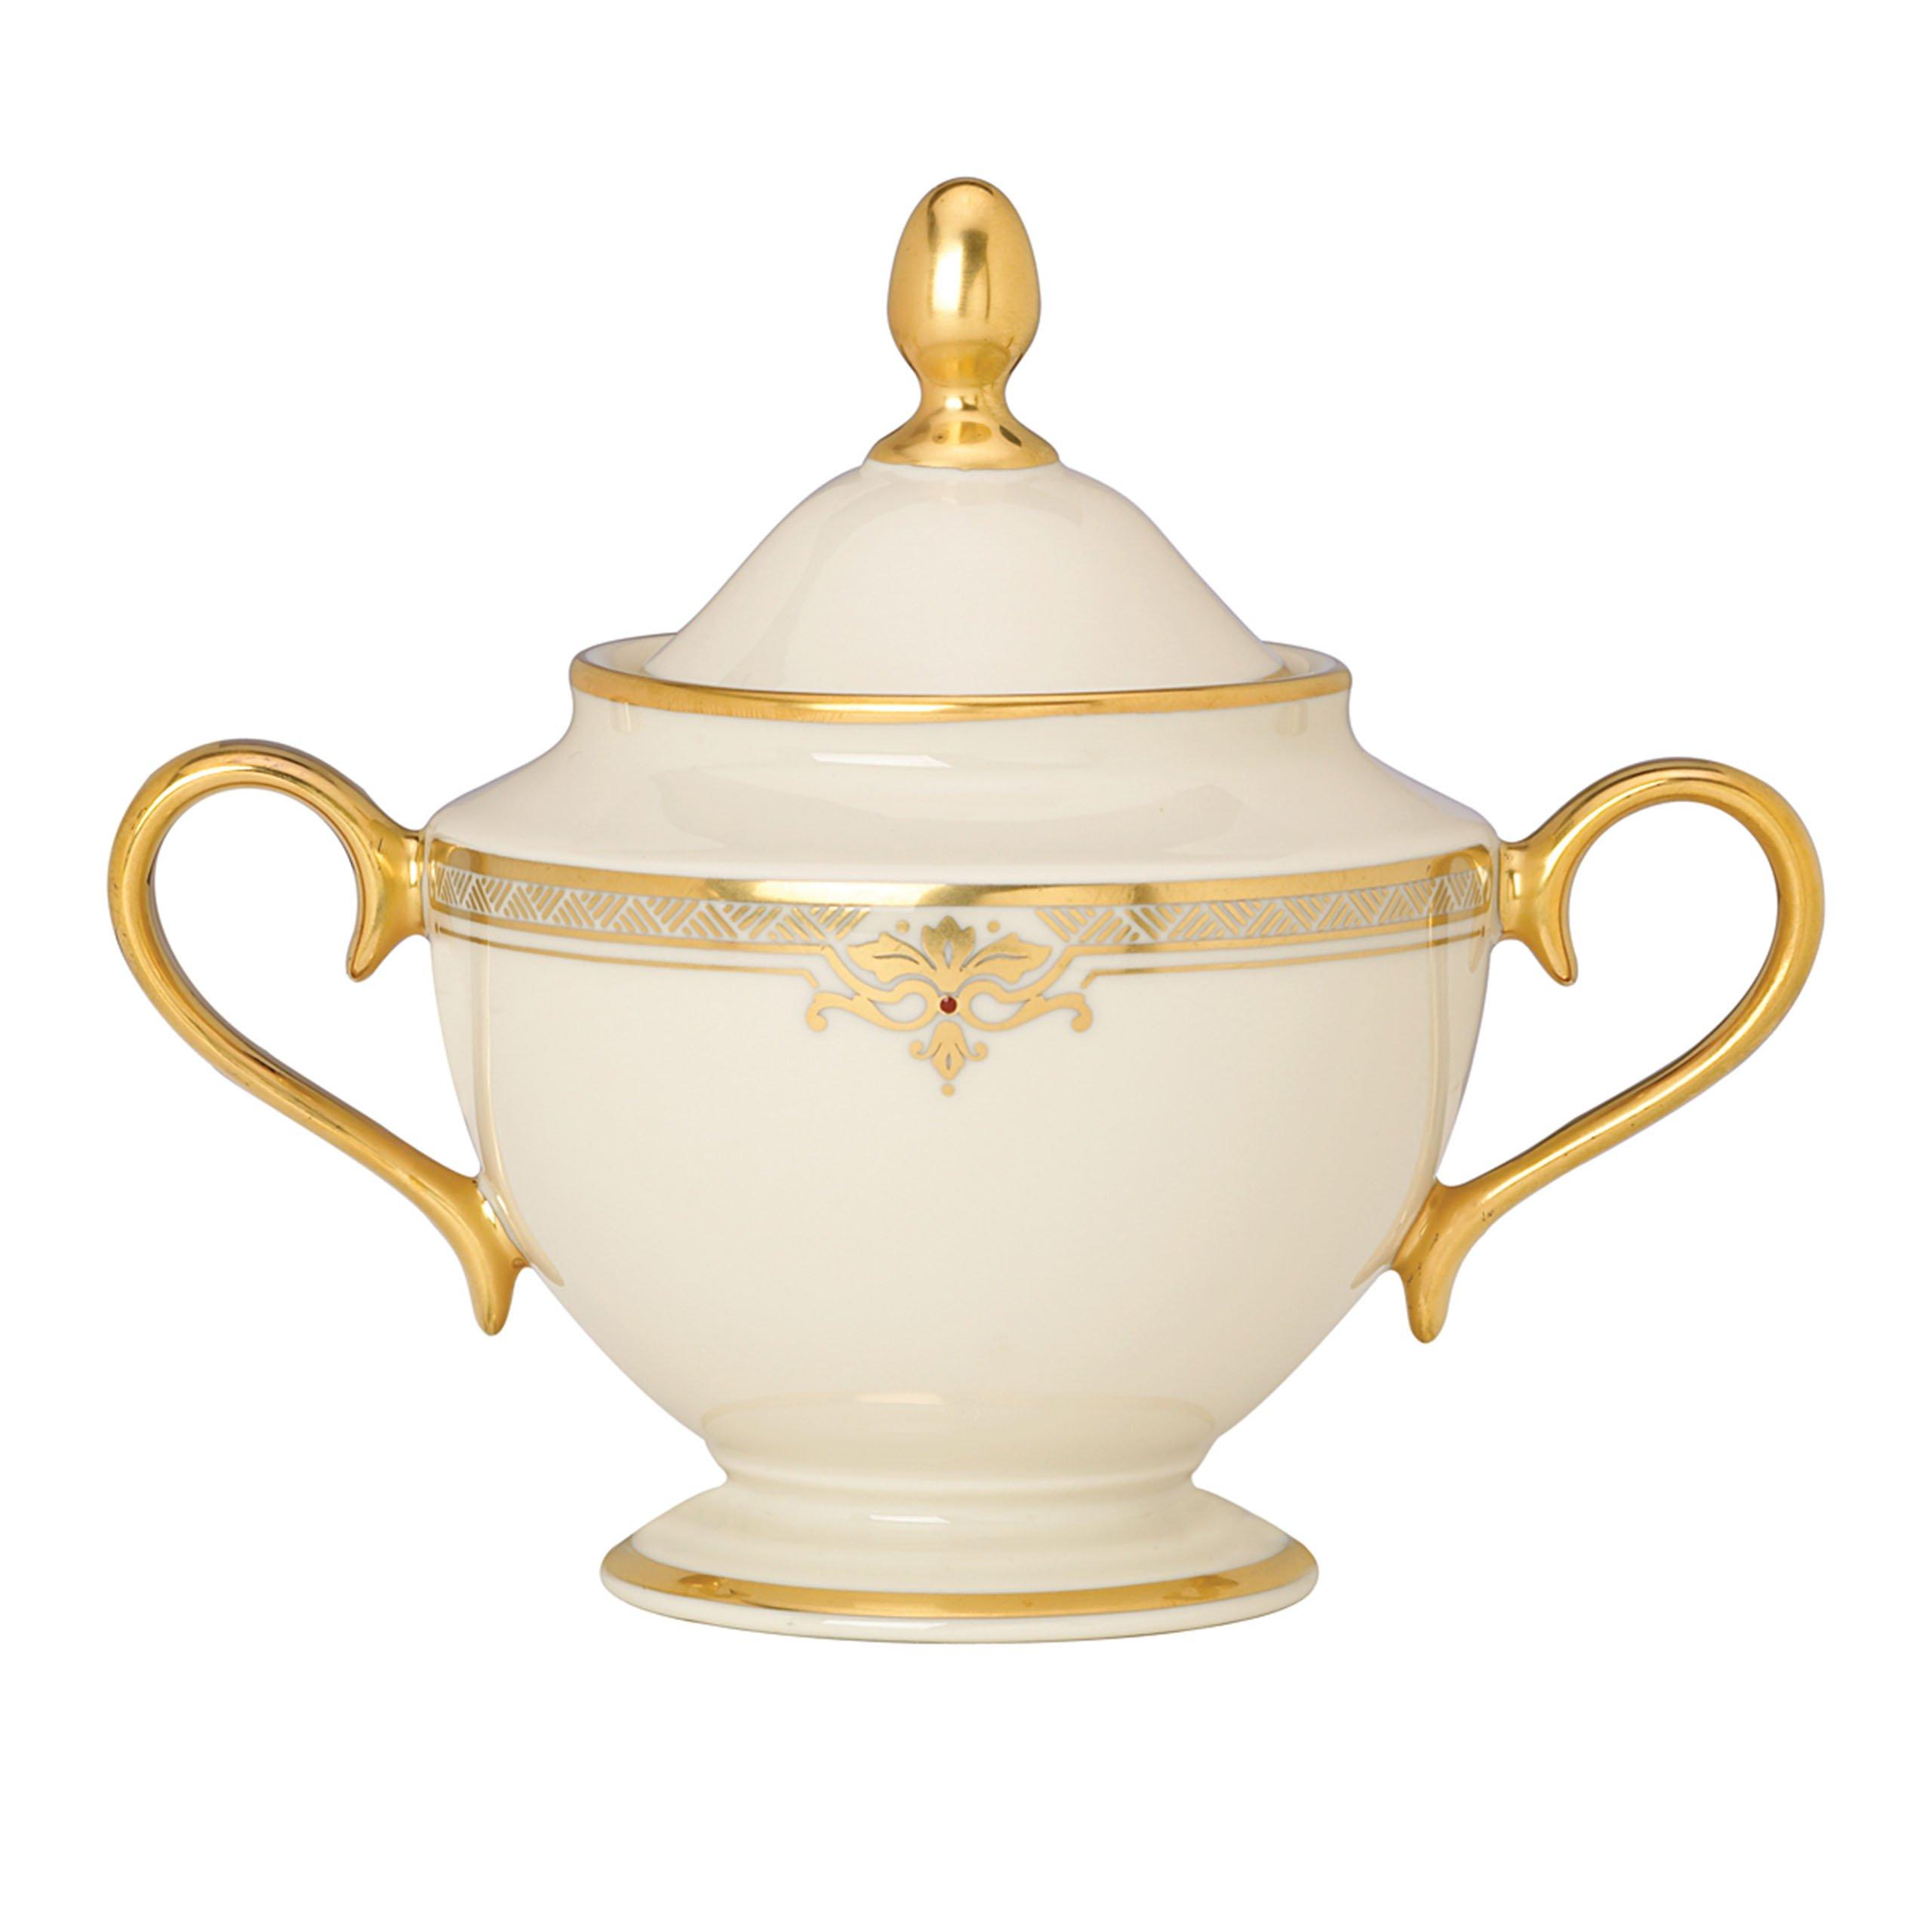 Lenox Republic Sugar Bowl with Lid by Lenox (Image #1)